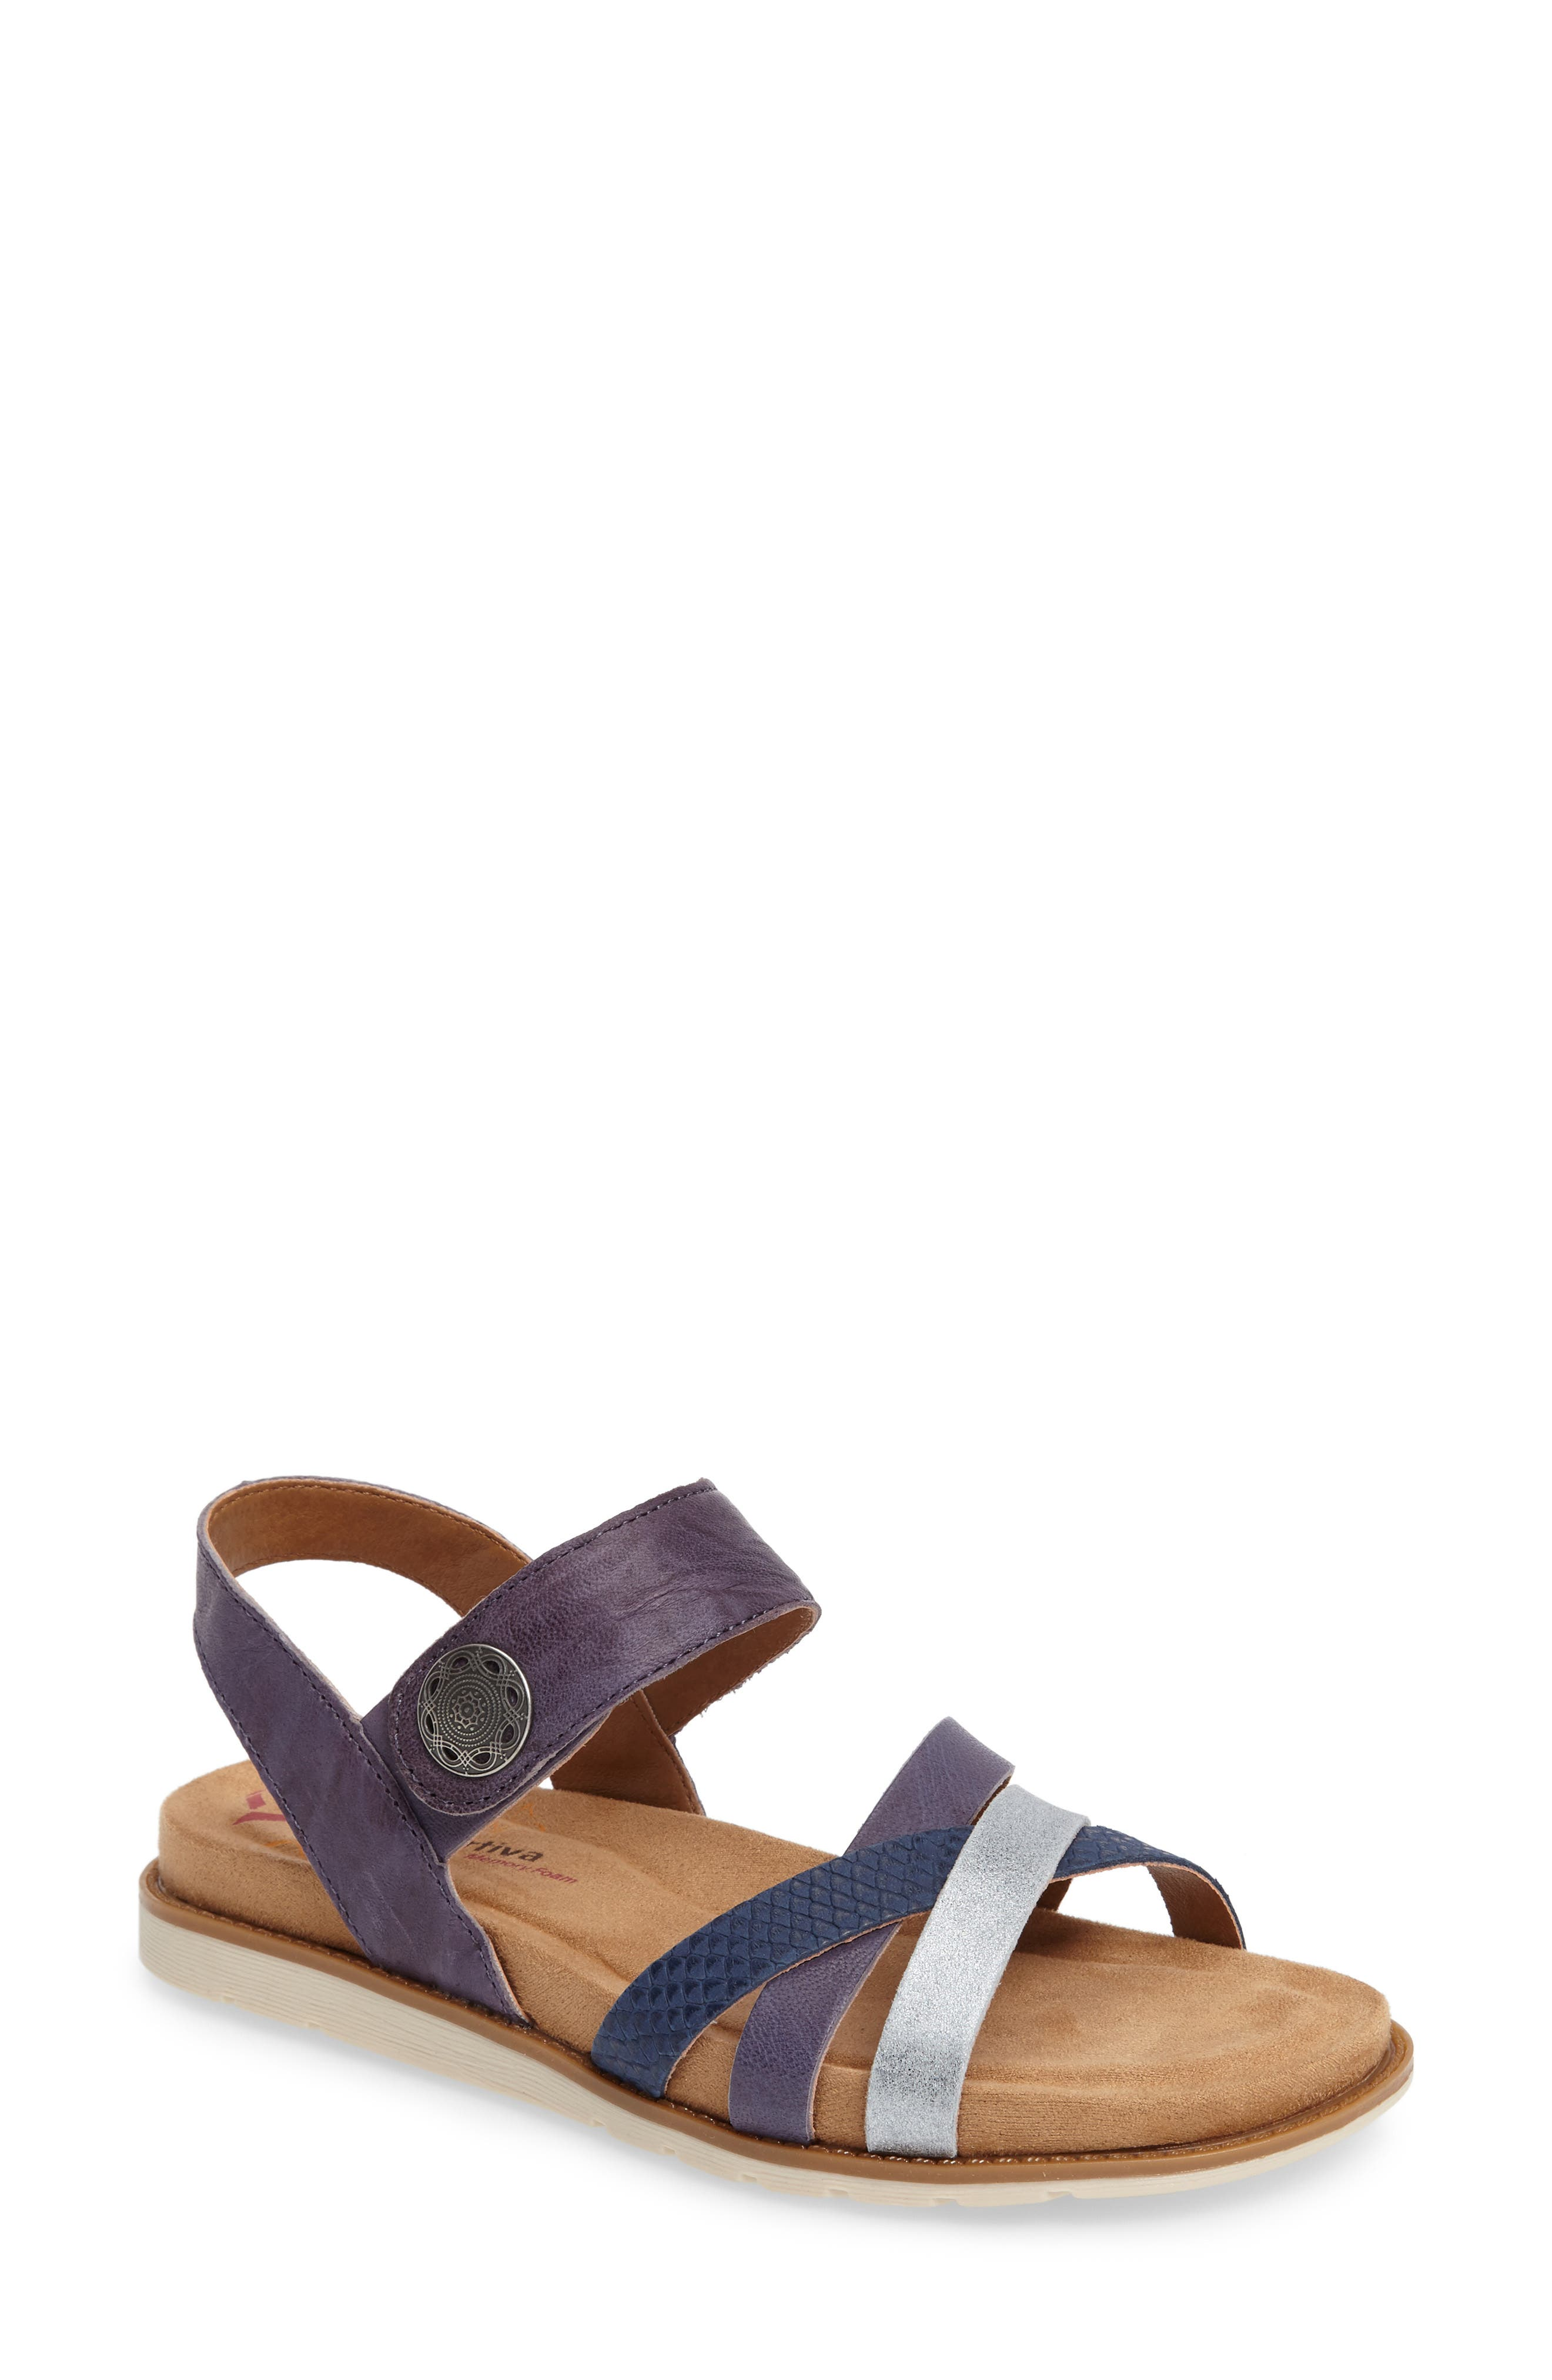 Alonsa Sandal,                         Main,                         color, Denim Leather